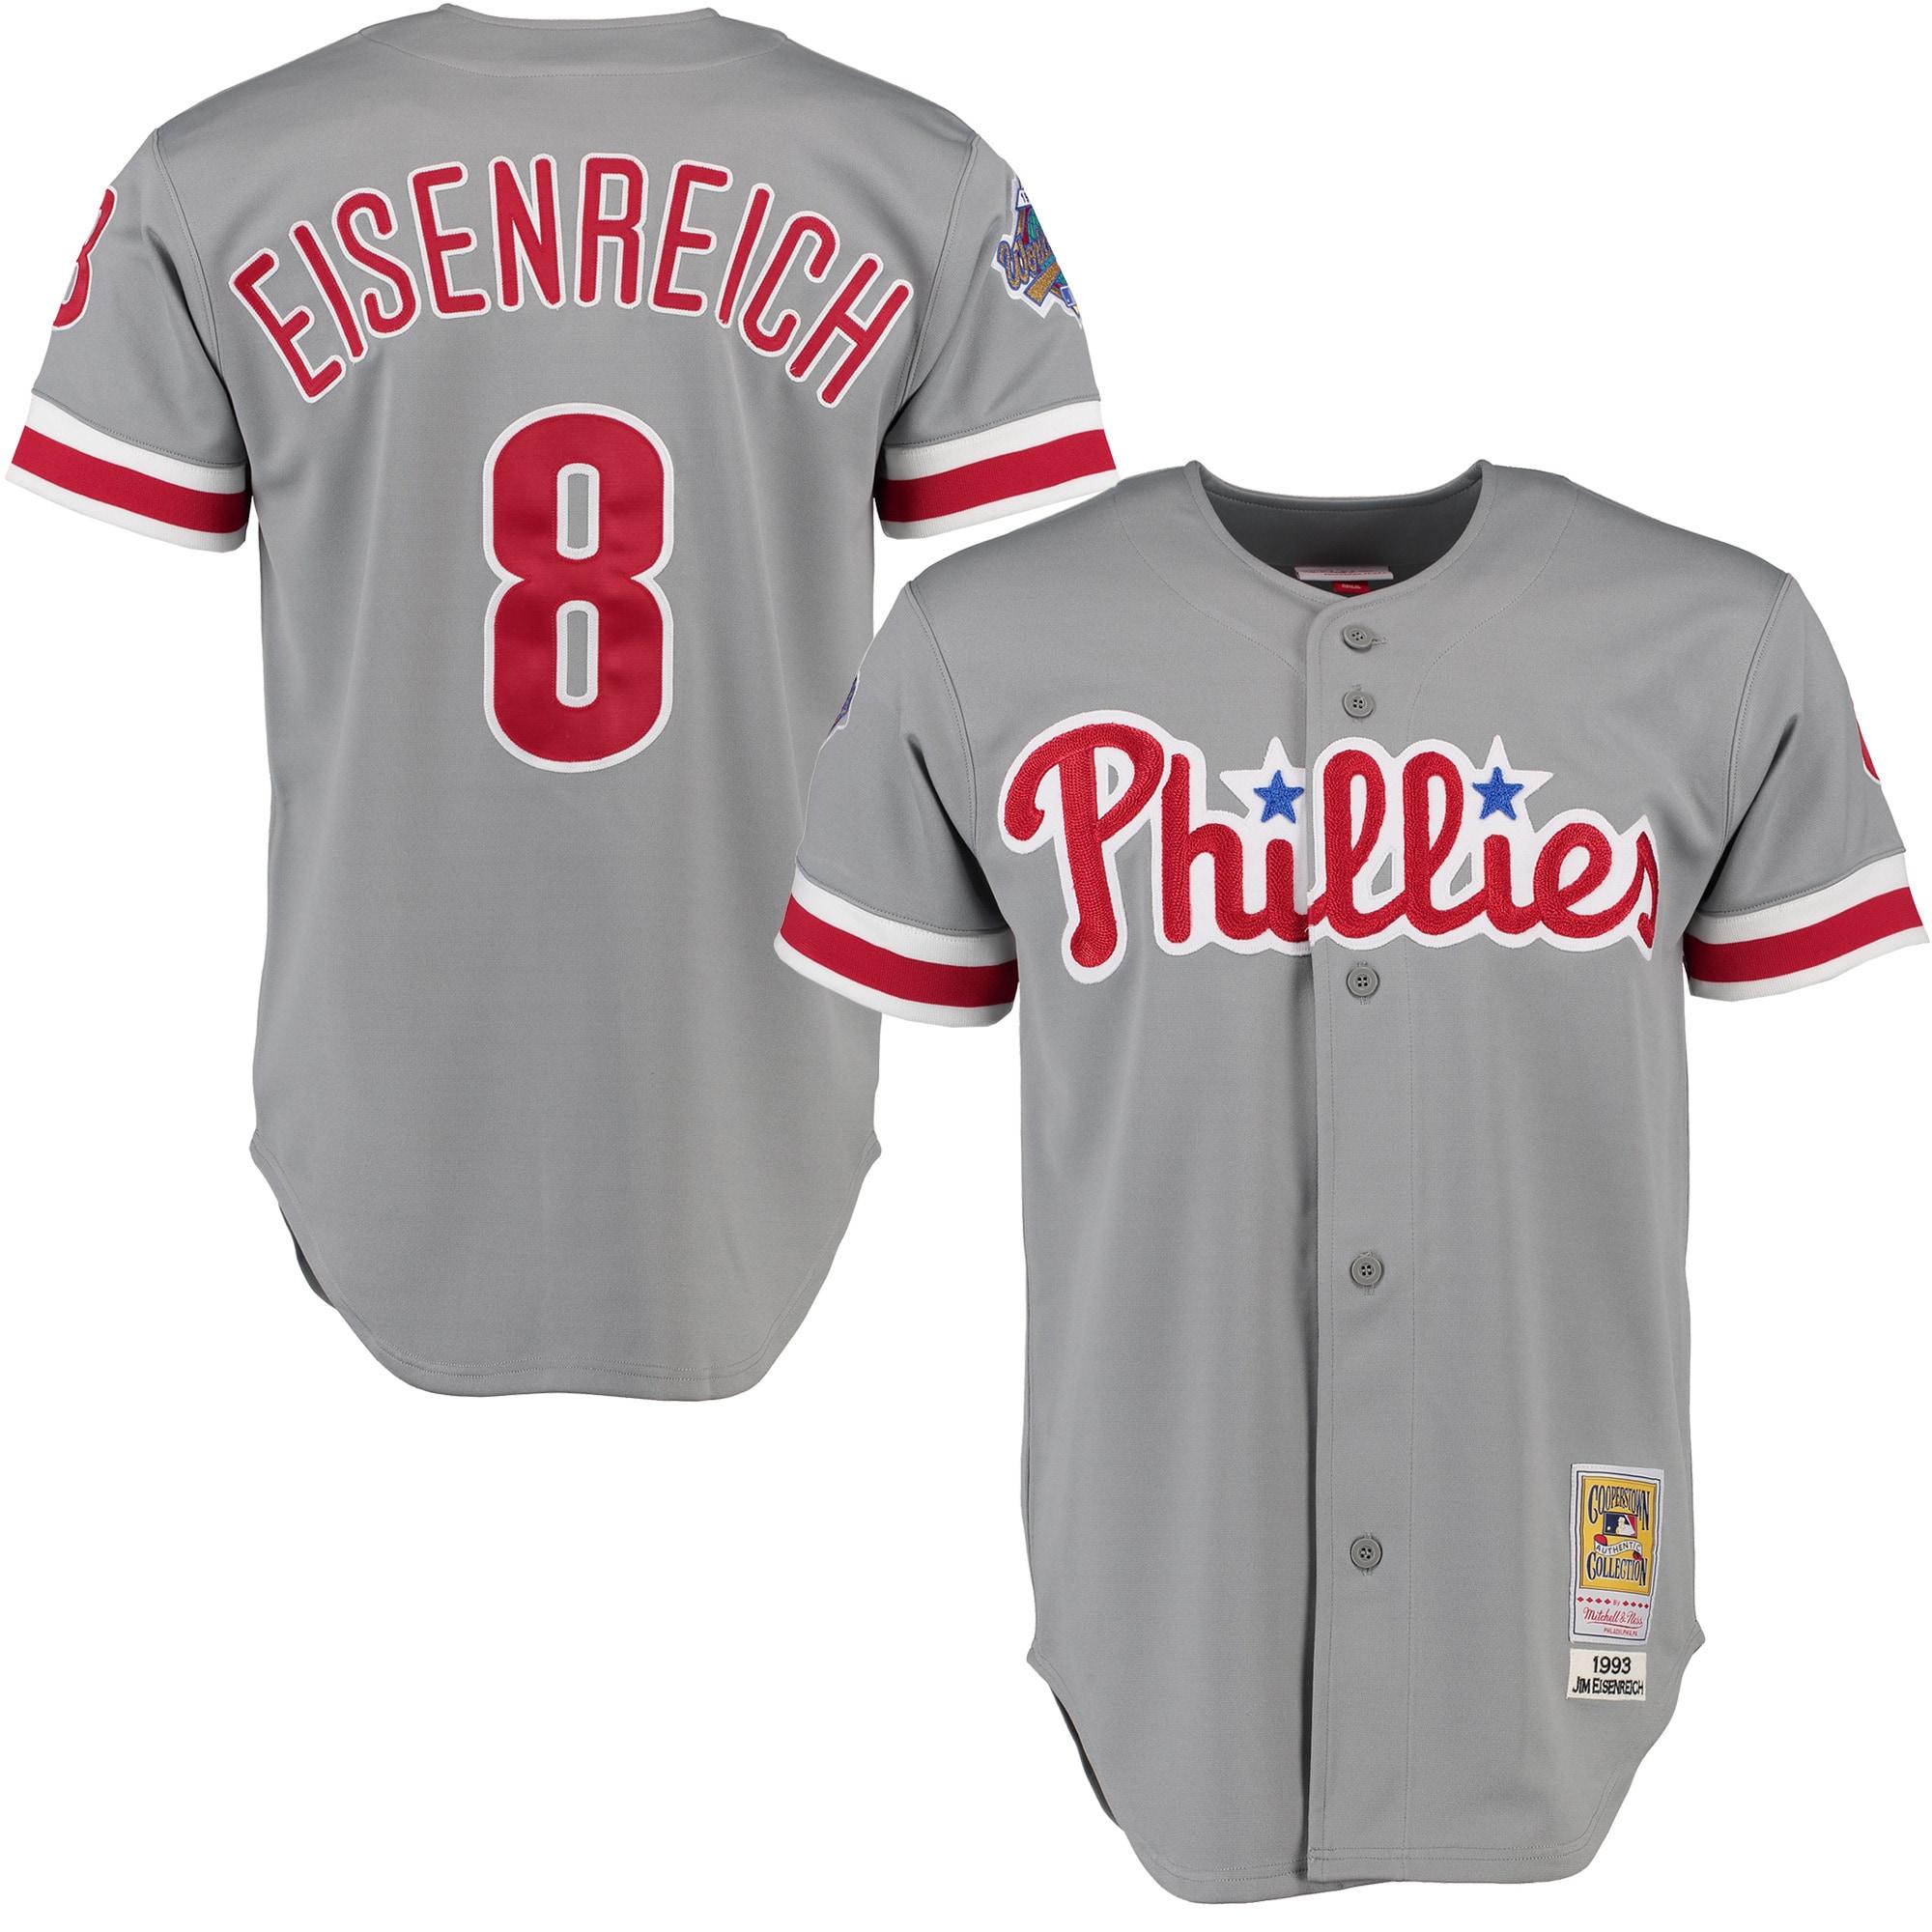 Jim Eisenreich 1993 Philadelphia Phillies Mitchell & Ness Road Authentic Throwback Jersey - Gray